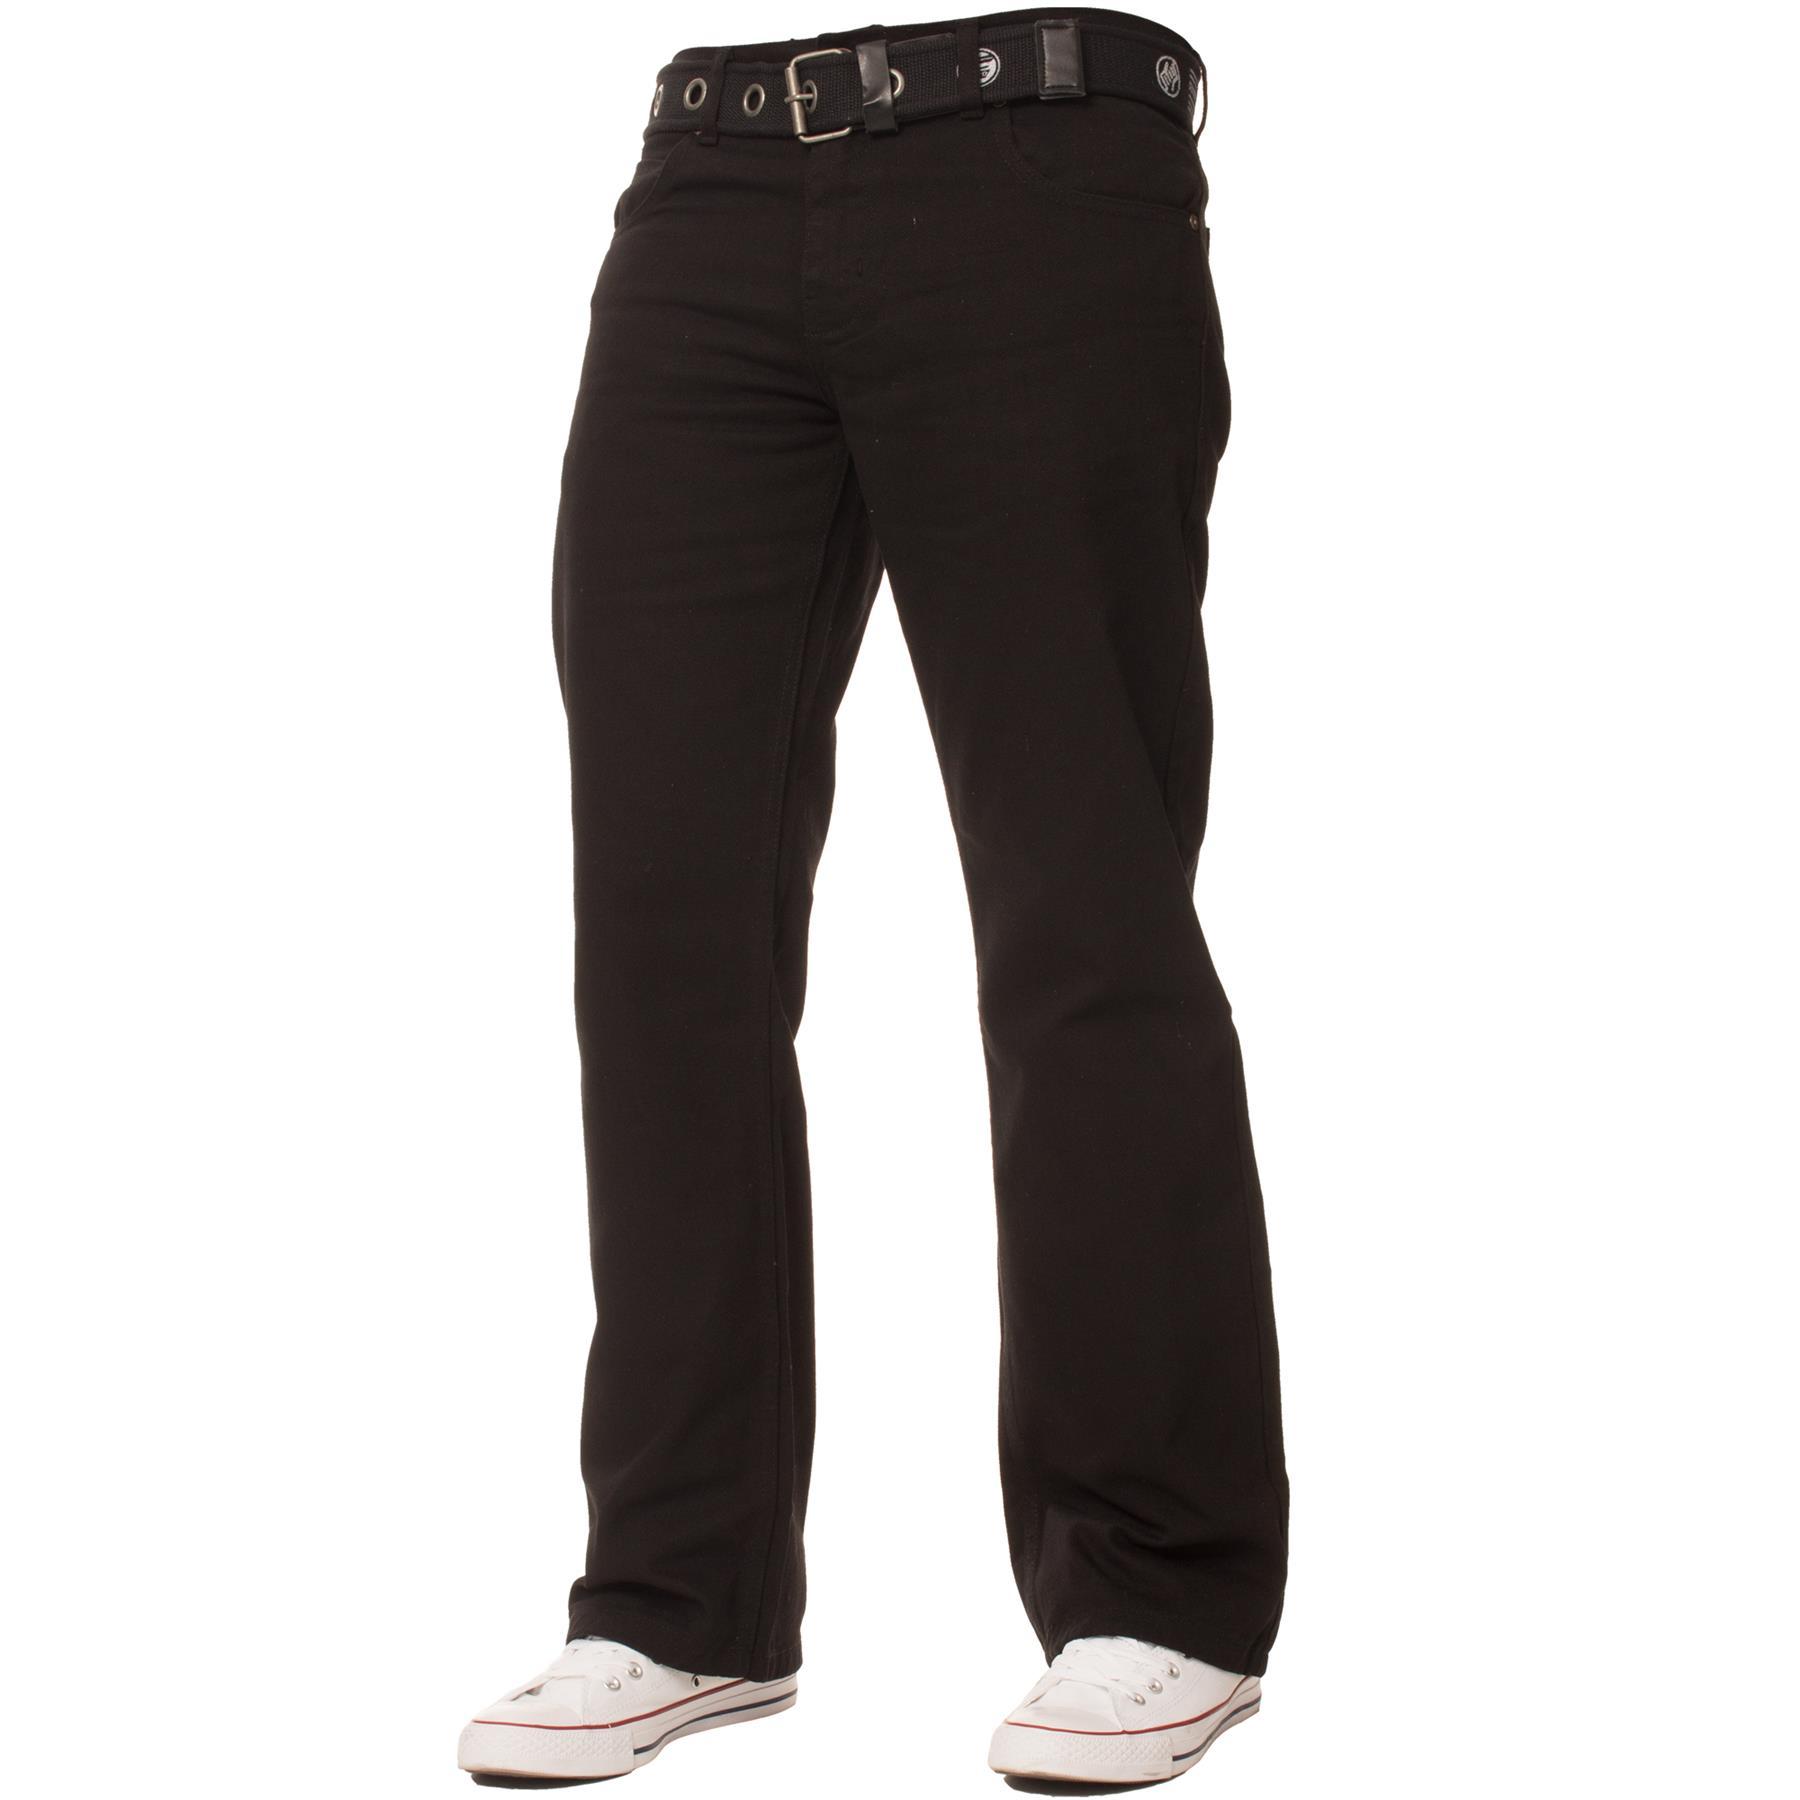 ENZO-Jeans-para-hombre-Big-Alto-Pierna-King-Size-Jeans-Pantalones-Chino-Pantalones-Pantalones-44-034 miniatura 42